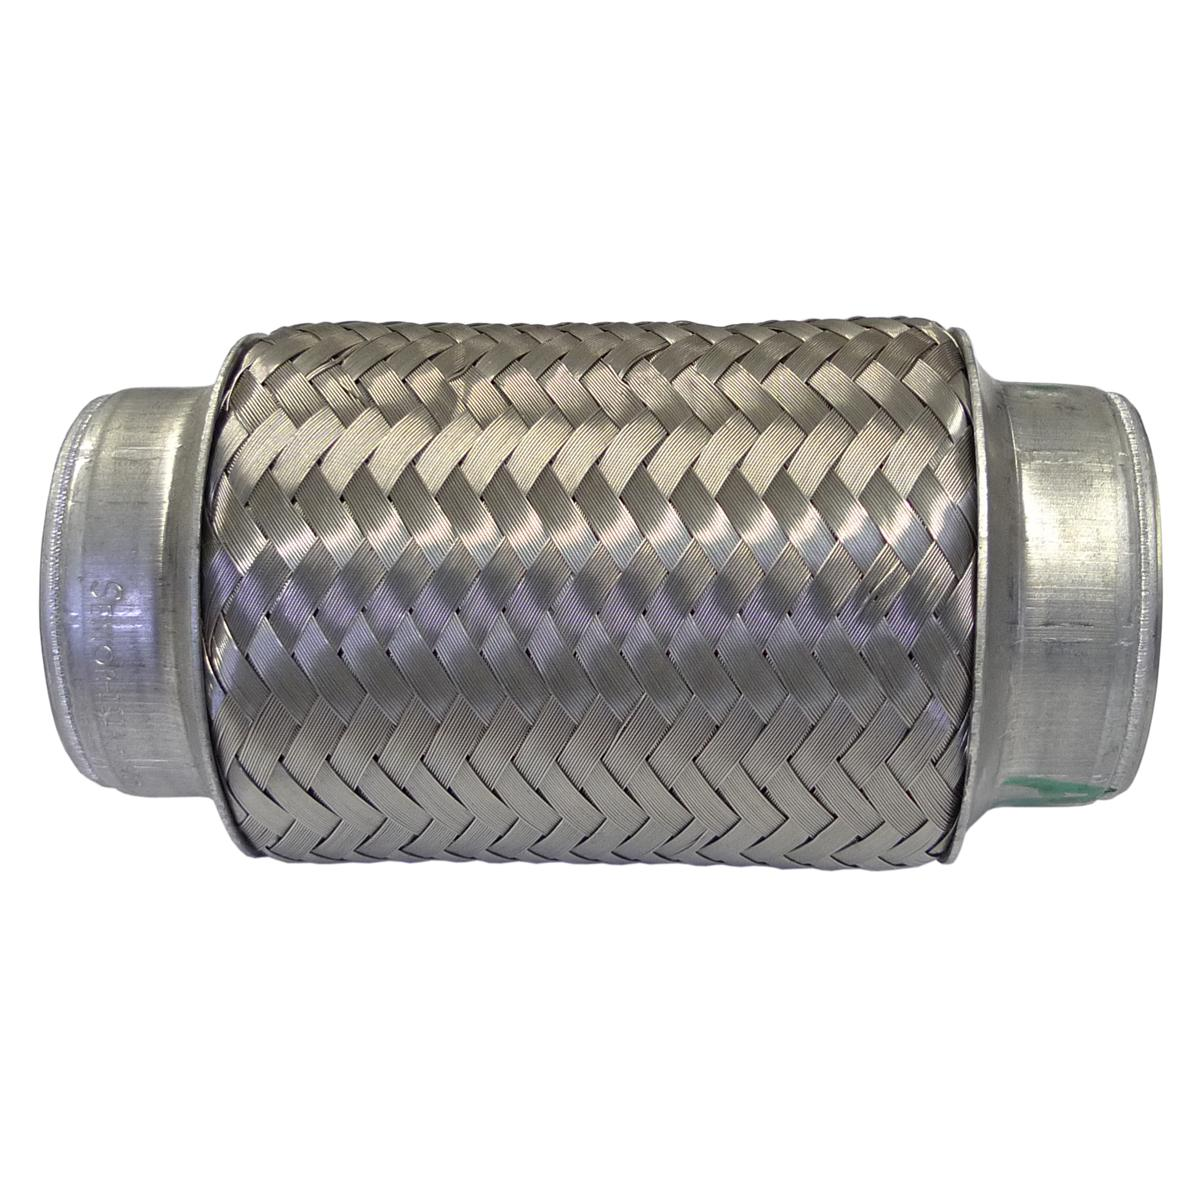 iloc flexible exhaust joint 3 inch inside diameter 6 inch long